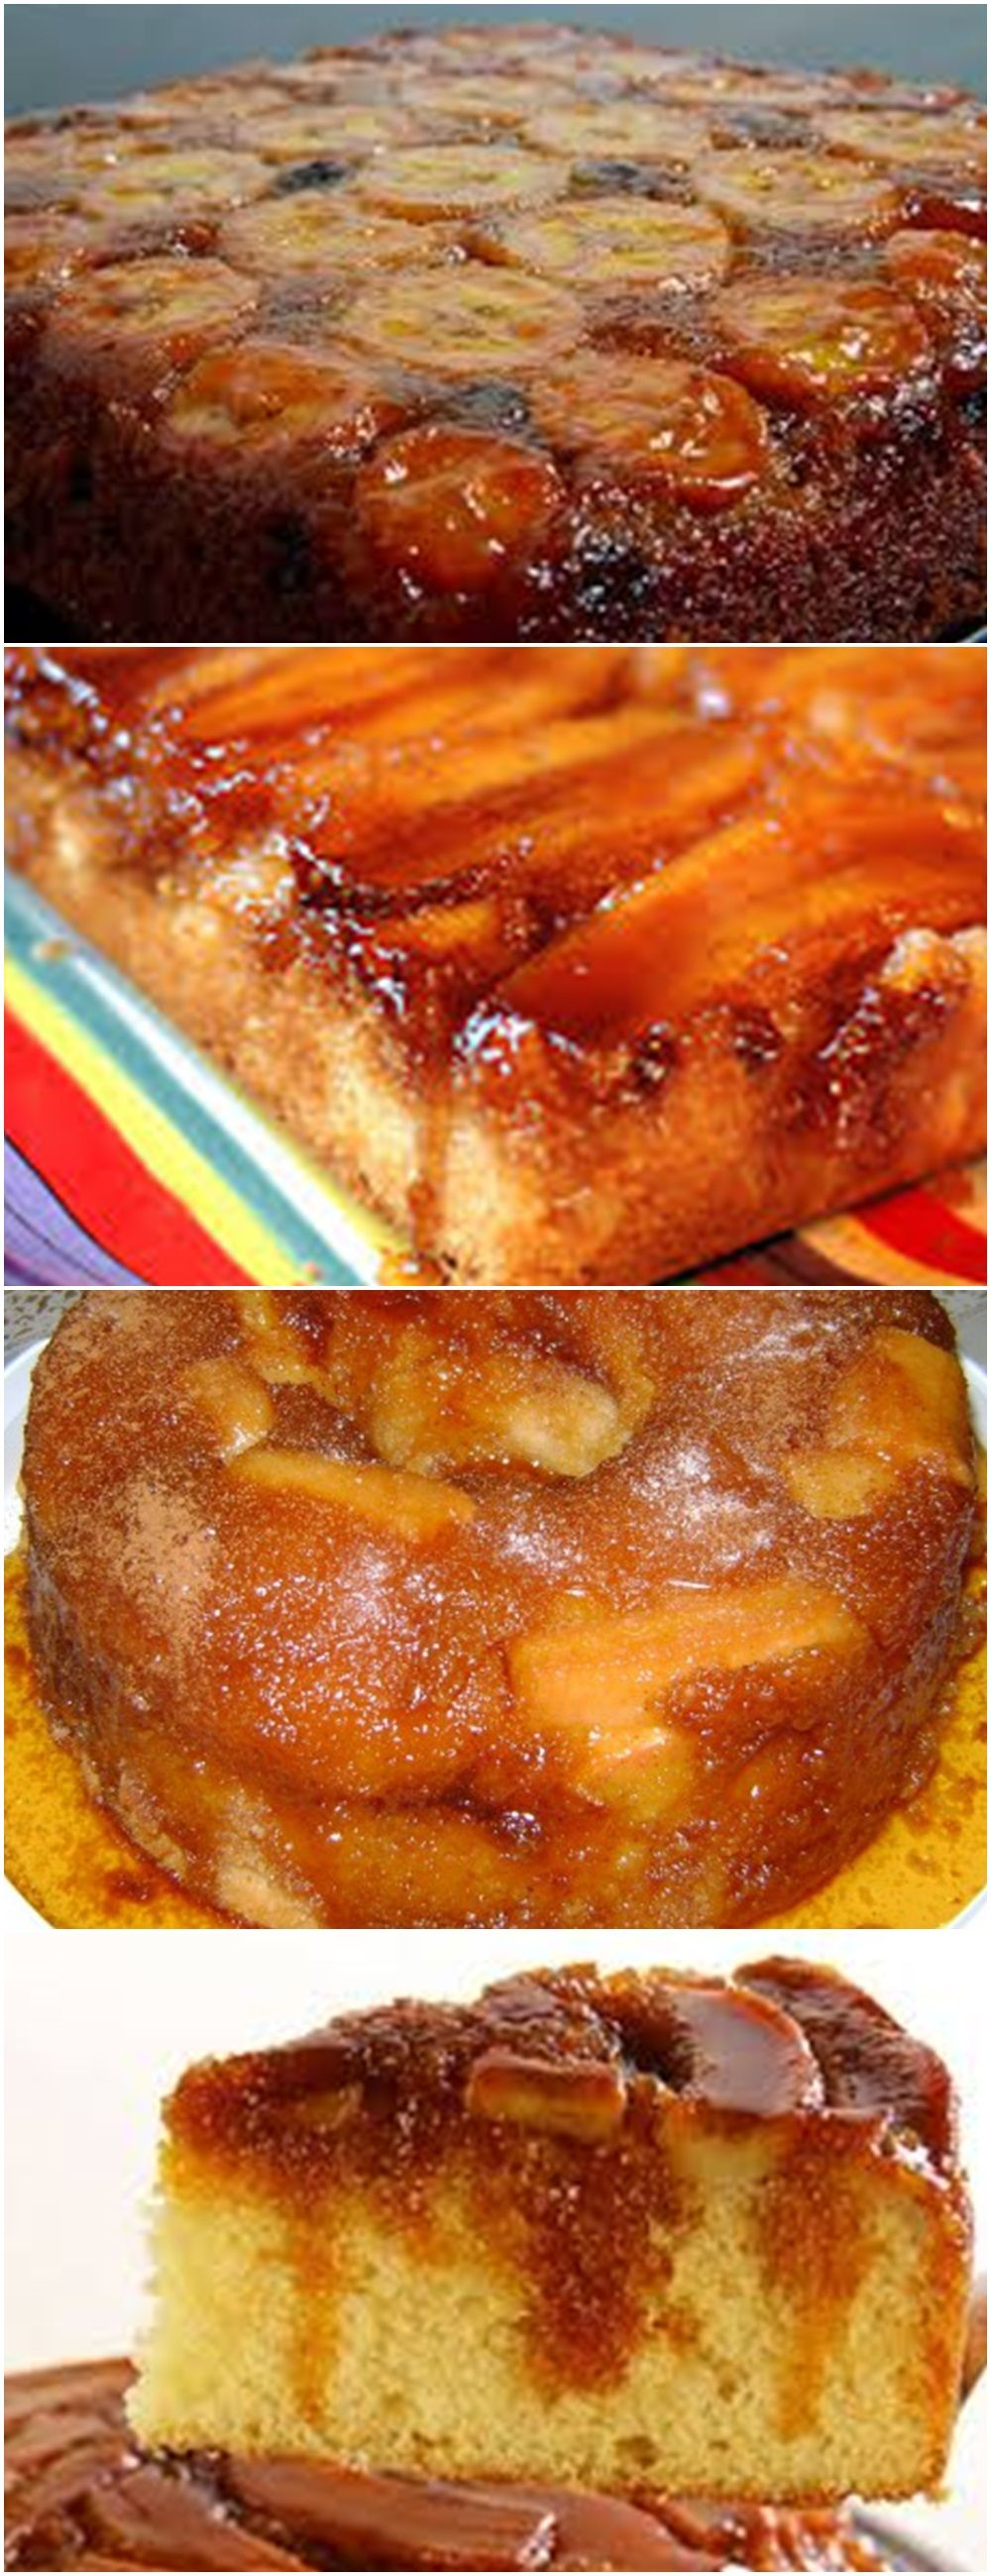 Bolo De Banana Com Calda Food Food And Drink Gastronomy